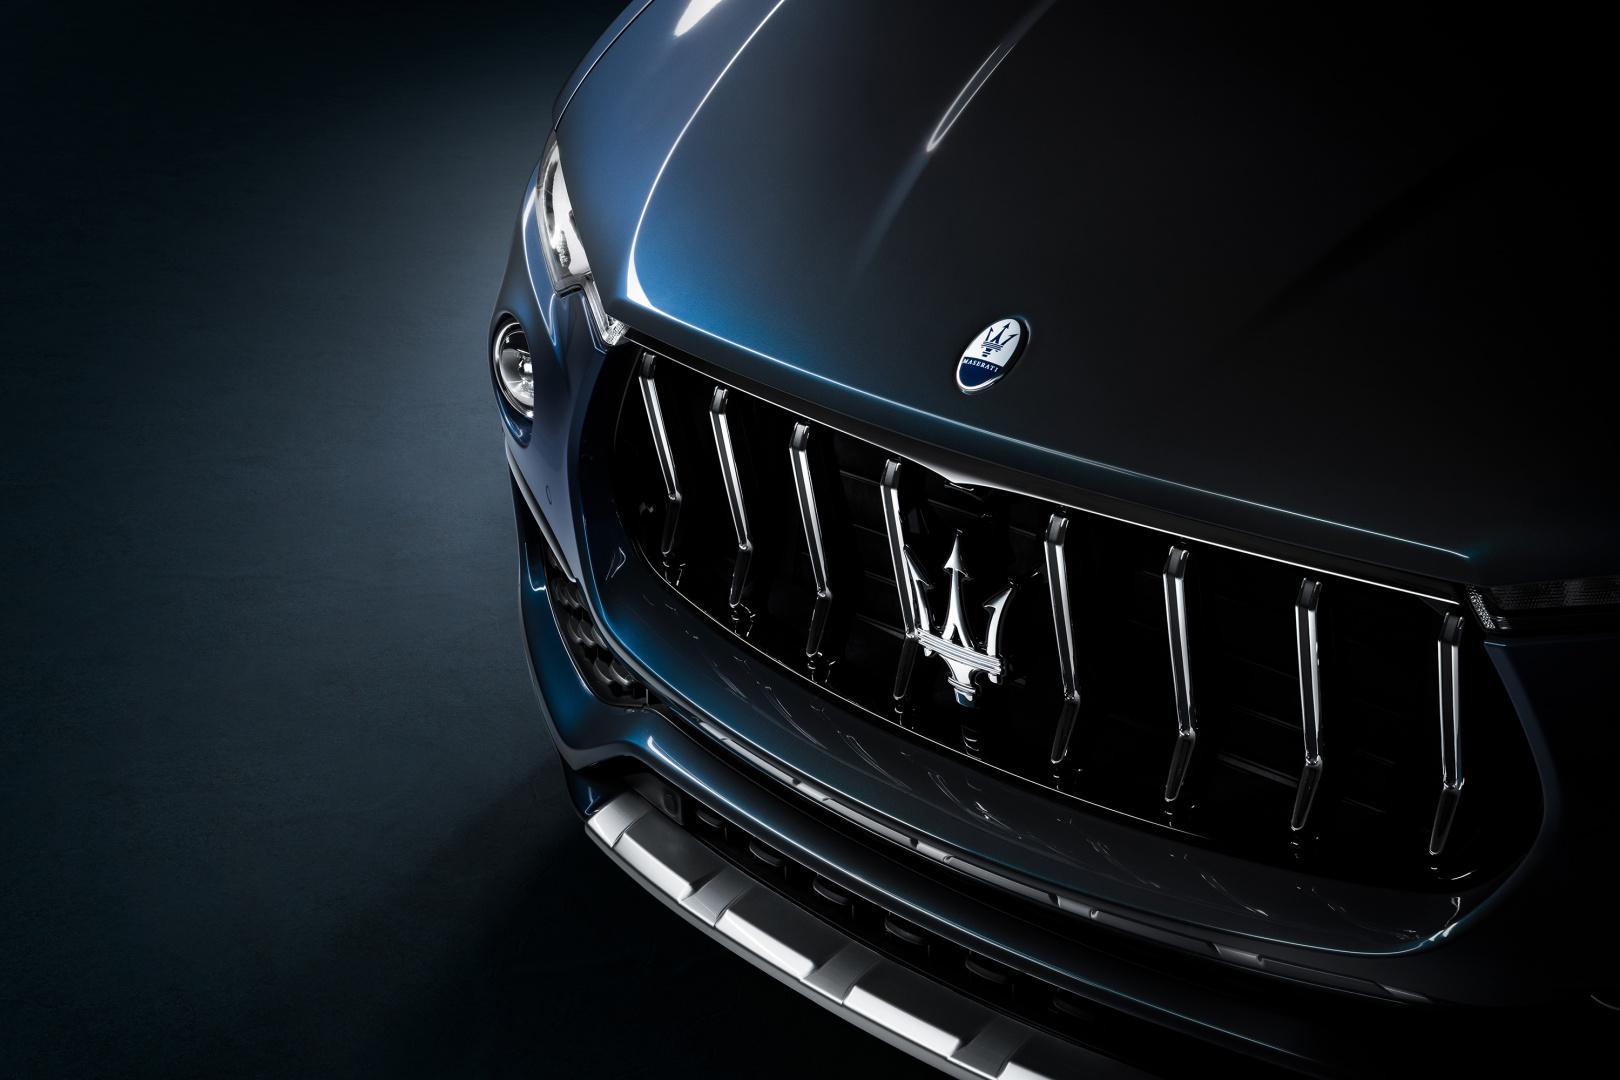 SMALL_17916-MaseratiLevanteHybrid